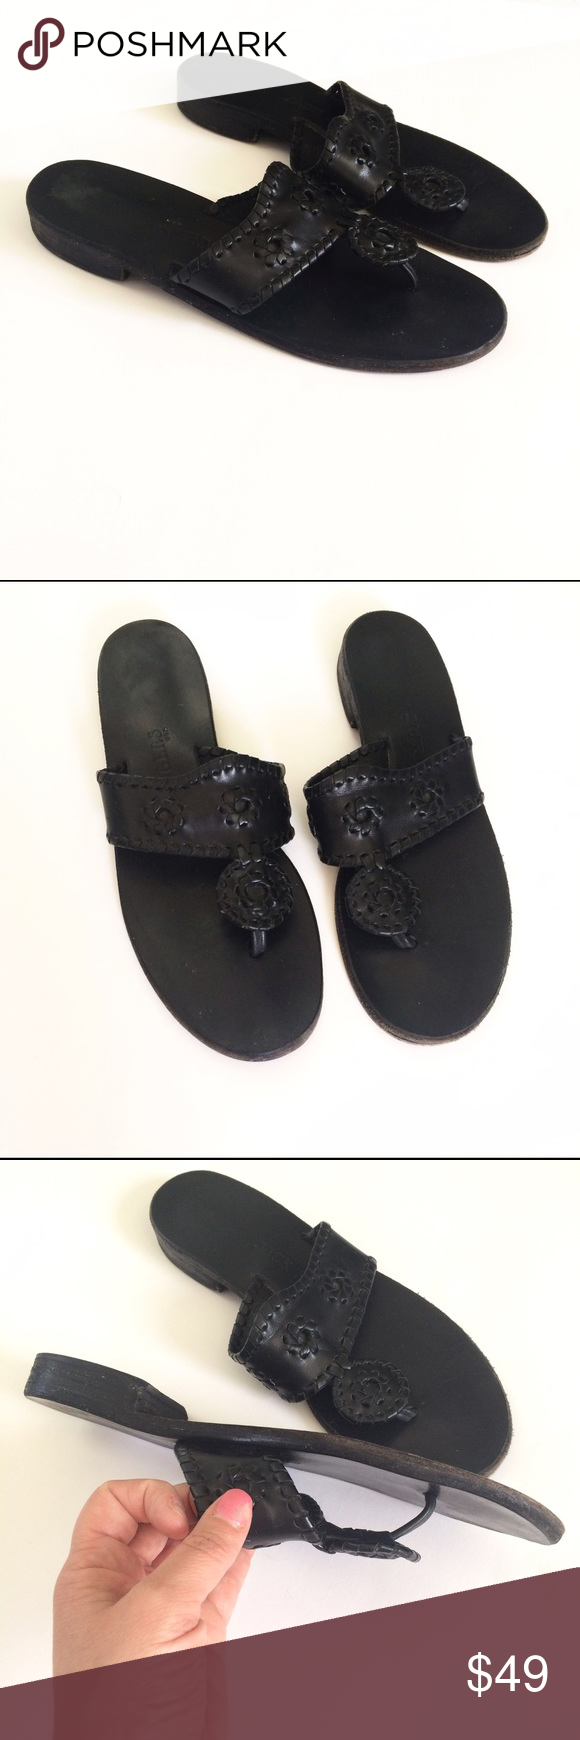 Black nice sandals - Jack Rogers Black Leather Capri Thong Sandals 10 Beautiful Capri Sandals From Jack Rogers All